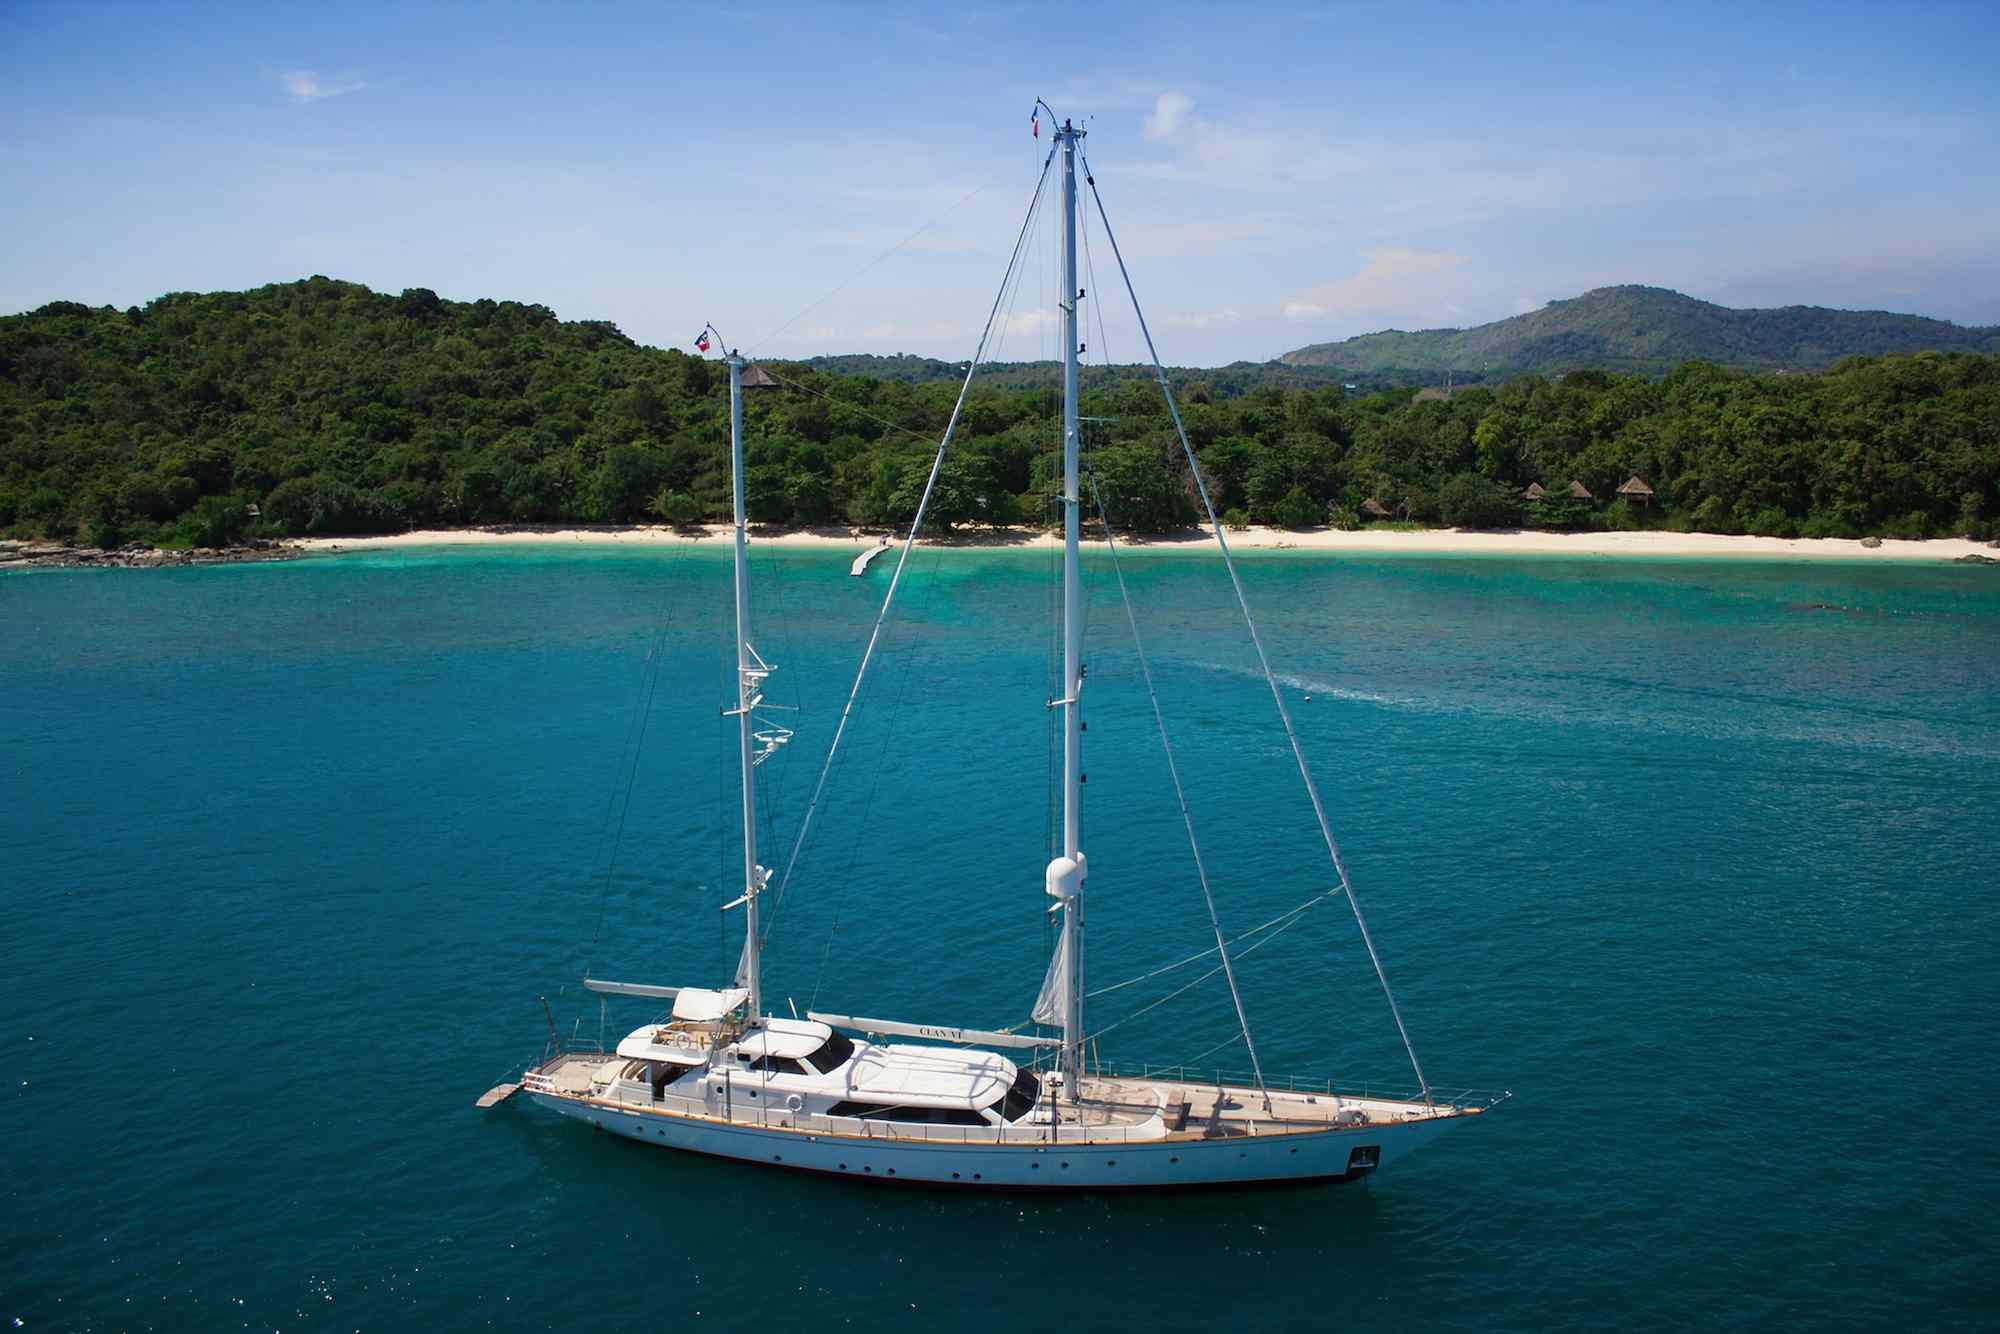 Clan VI_sailing along the coastline of an island_XS.jpeg